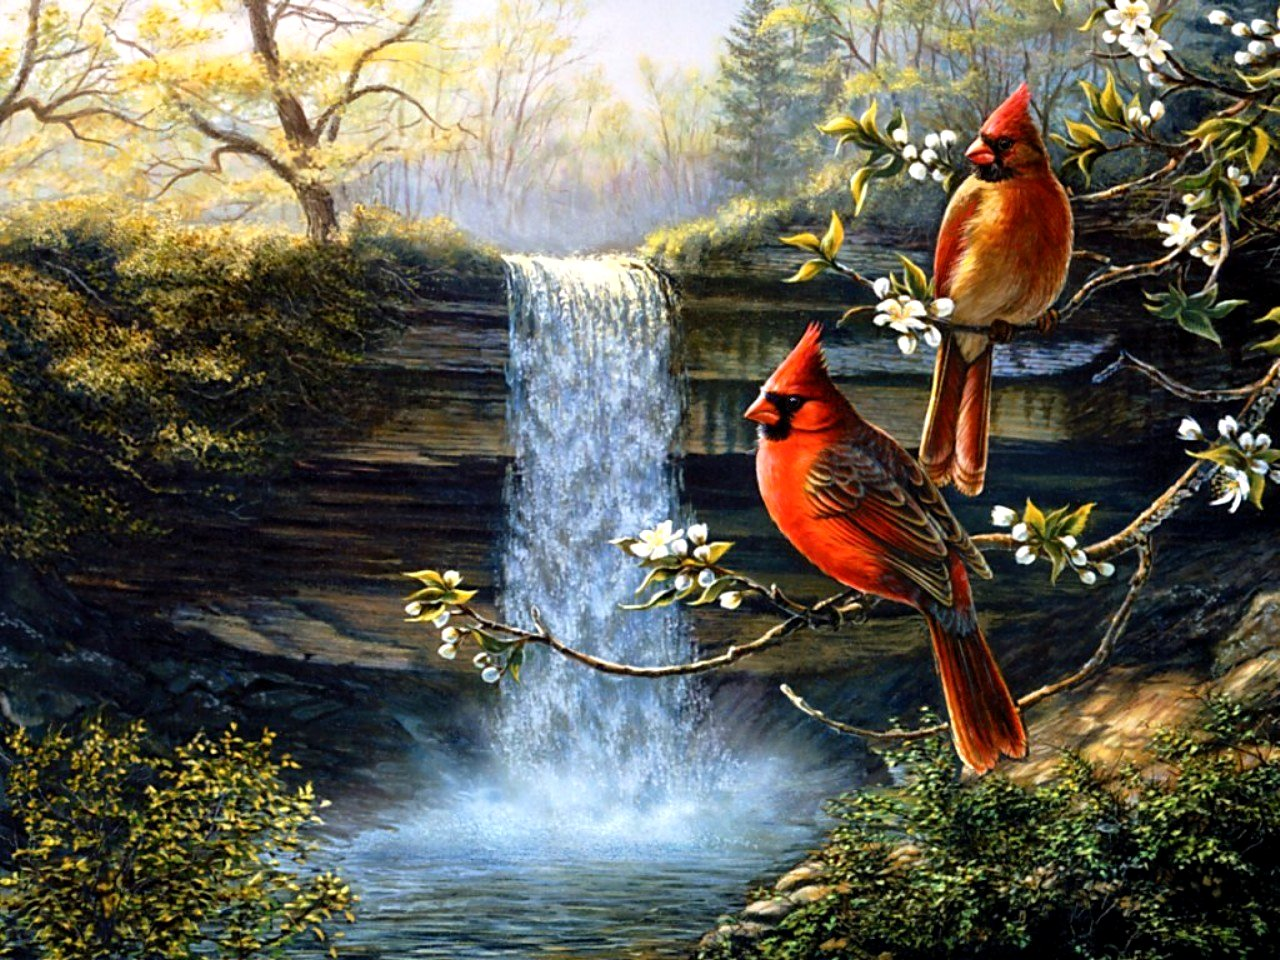 Cardinals birds   HERITAGE CARDINALS Wallpapers   HD Wallpapers 95125 1280x960